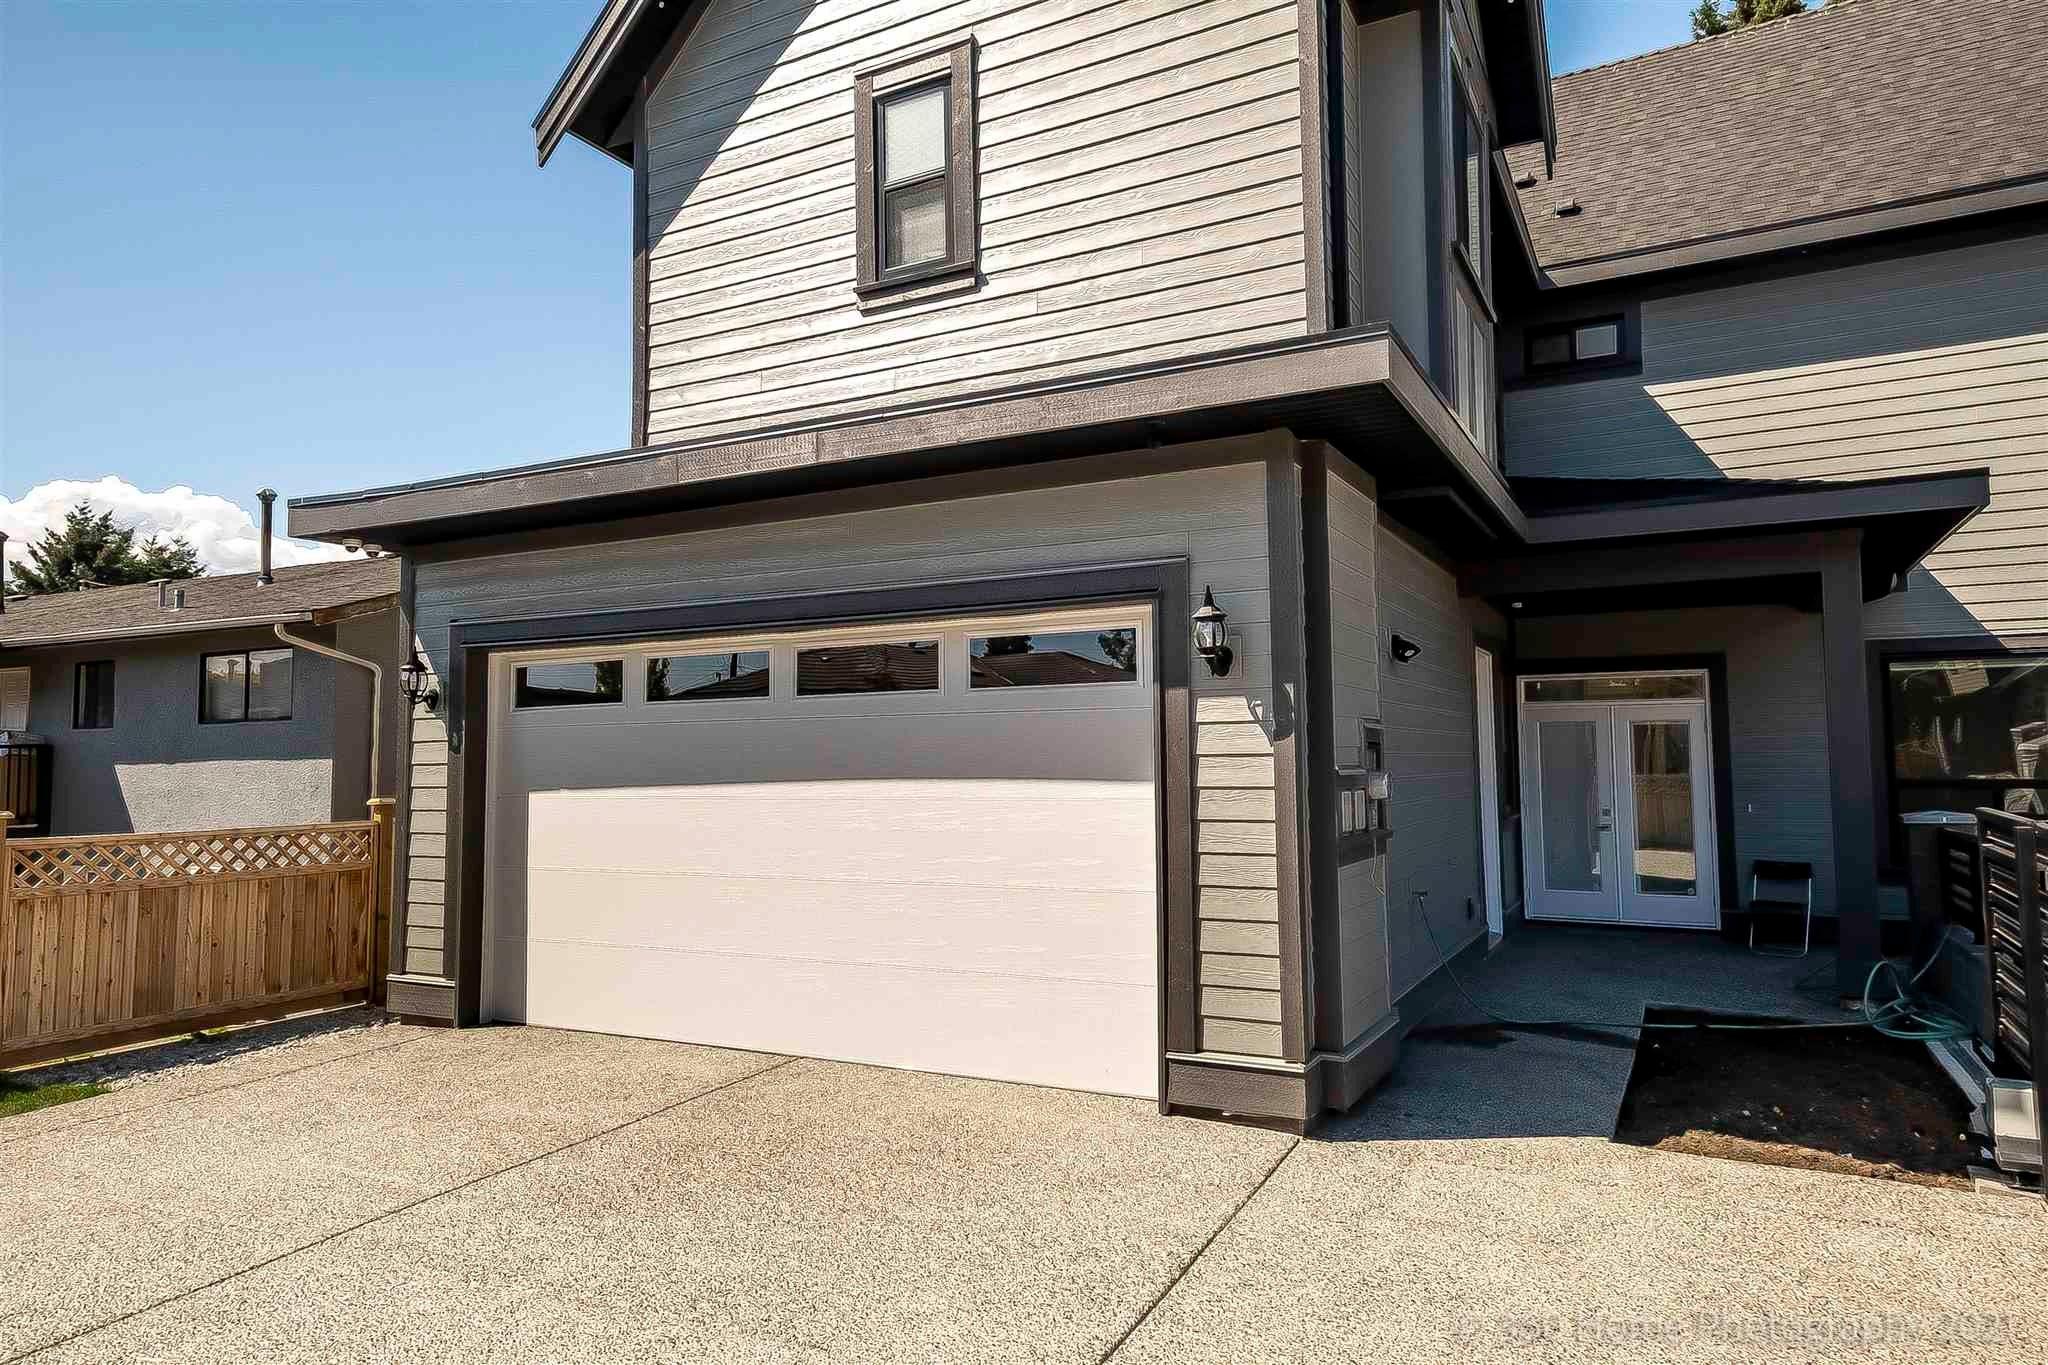 13050 101B AVENUE - Cedar Hills House/Single Family for sale, 5 Bedrooms (R2602208) - #4